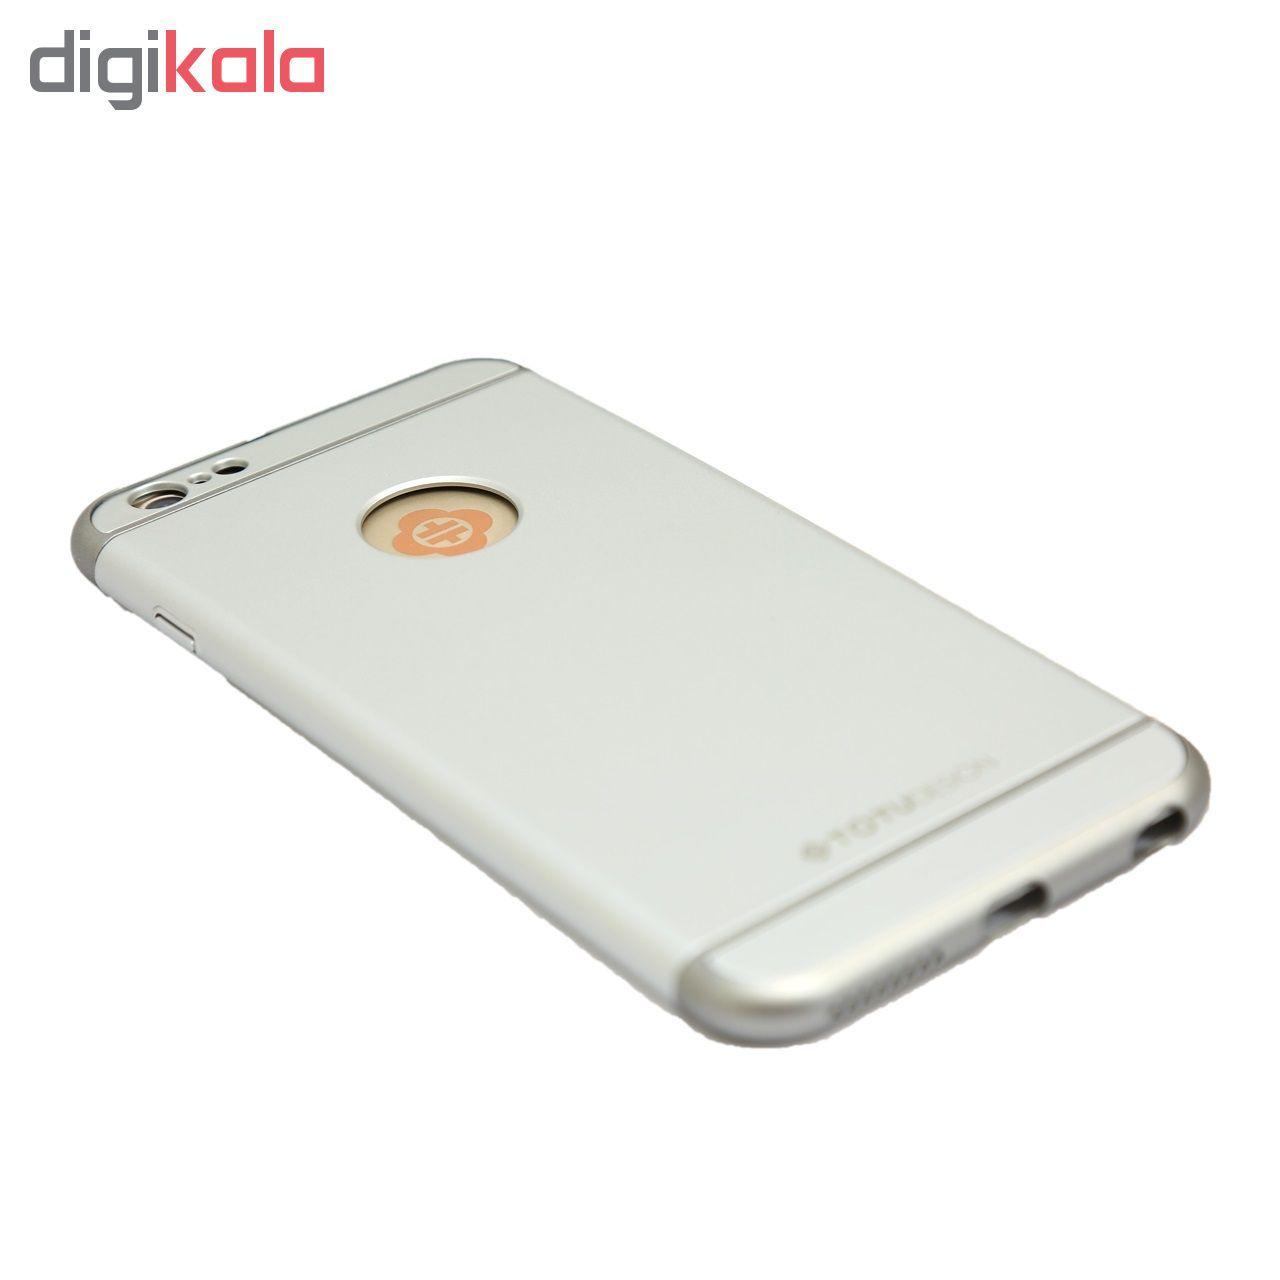 کاور توتو دیزاین مدل Armour Series مناسب برای گوشی موبایل اپل iPhone 6/6s main 1 4